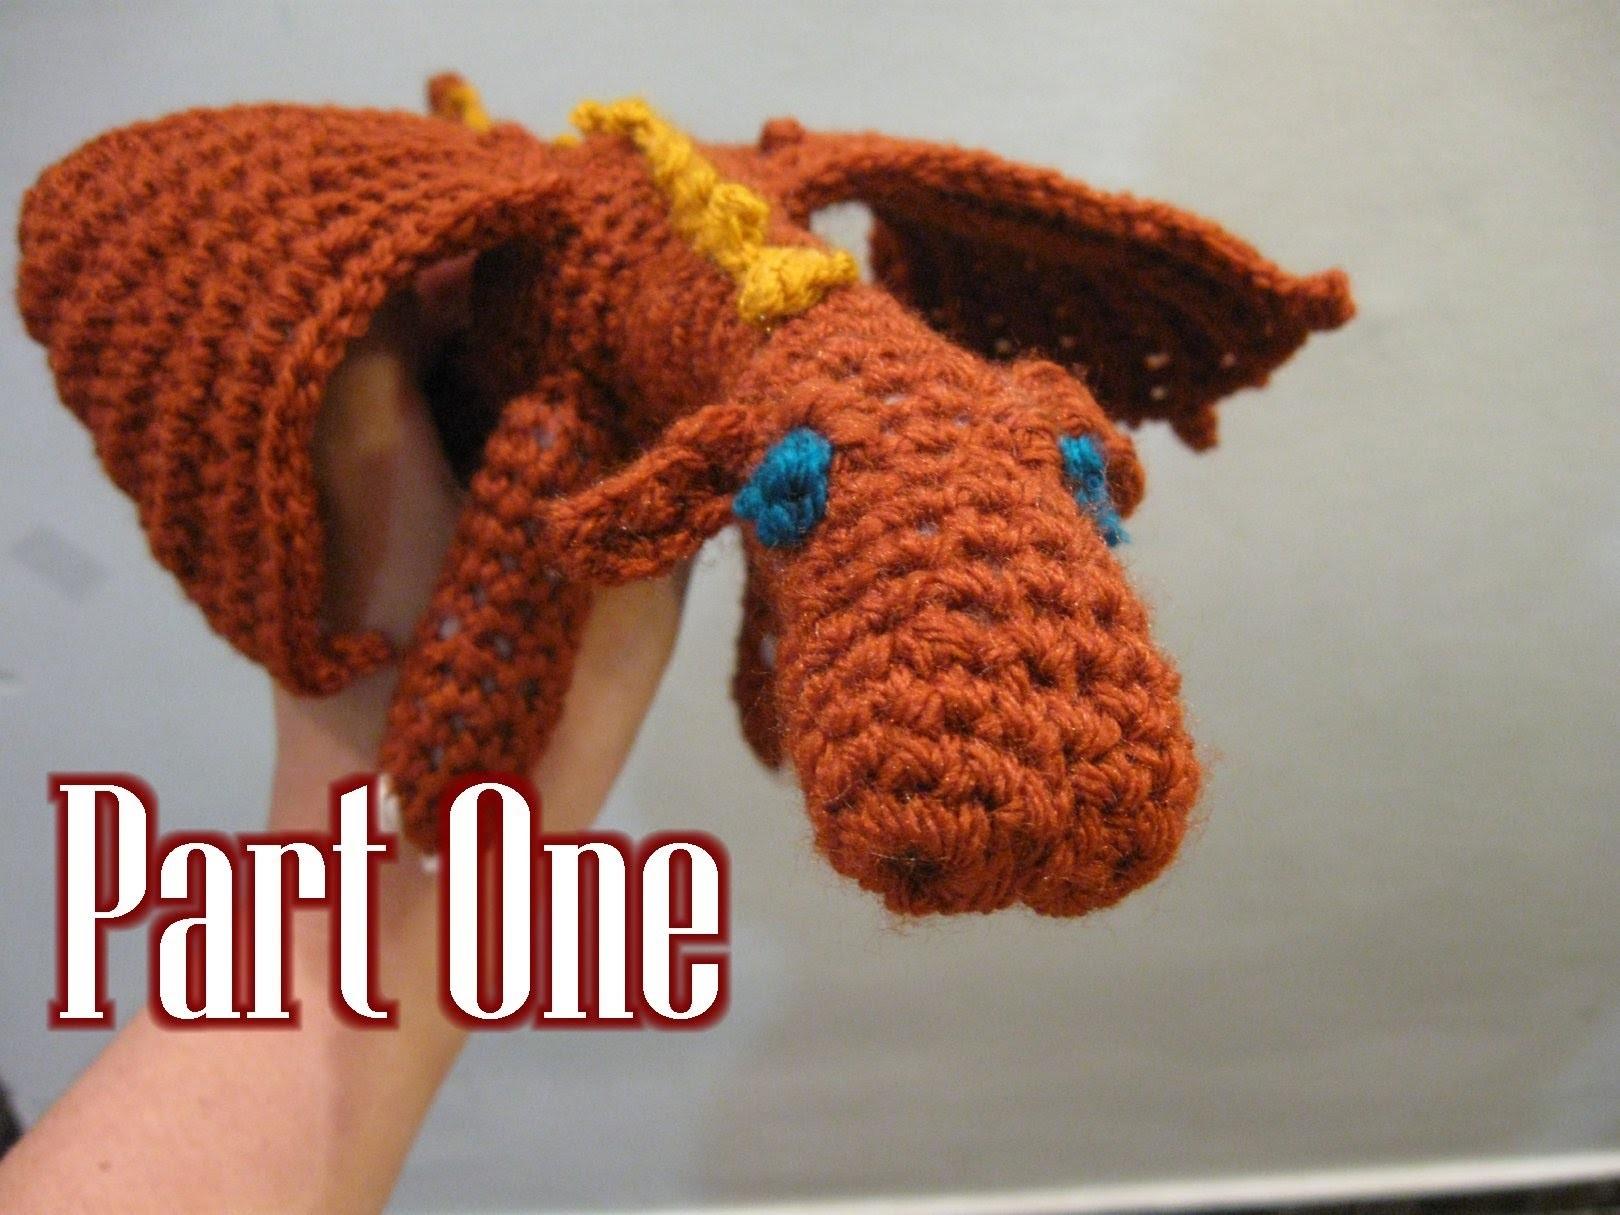 Crochet Amigurumi Fierce Dragon Tutorial pt 1